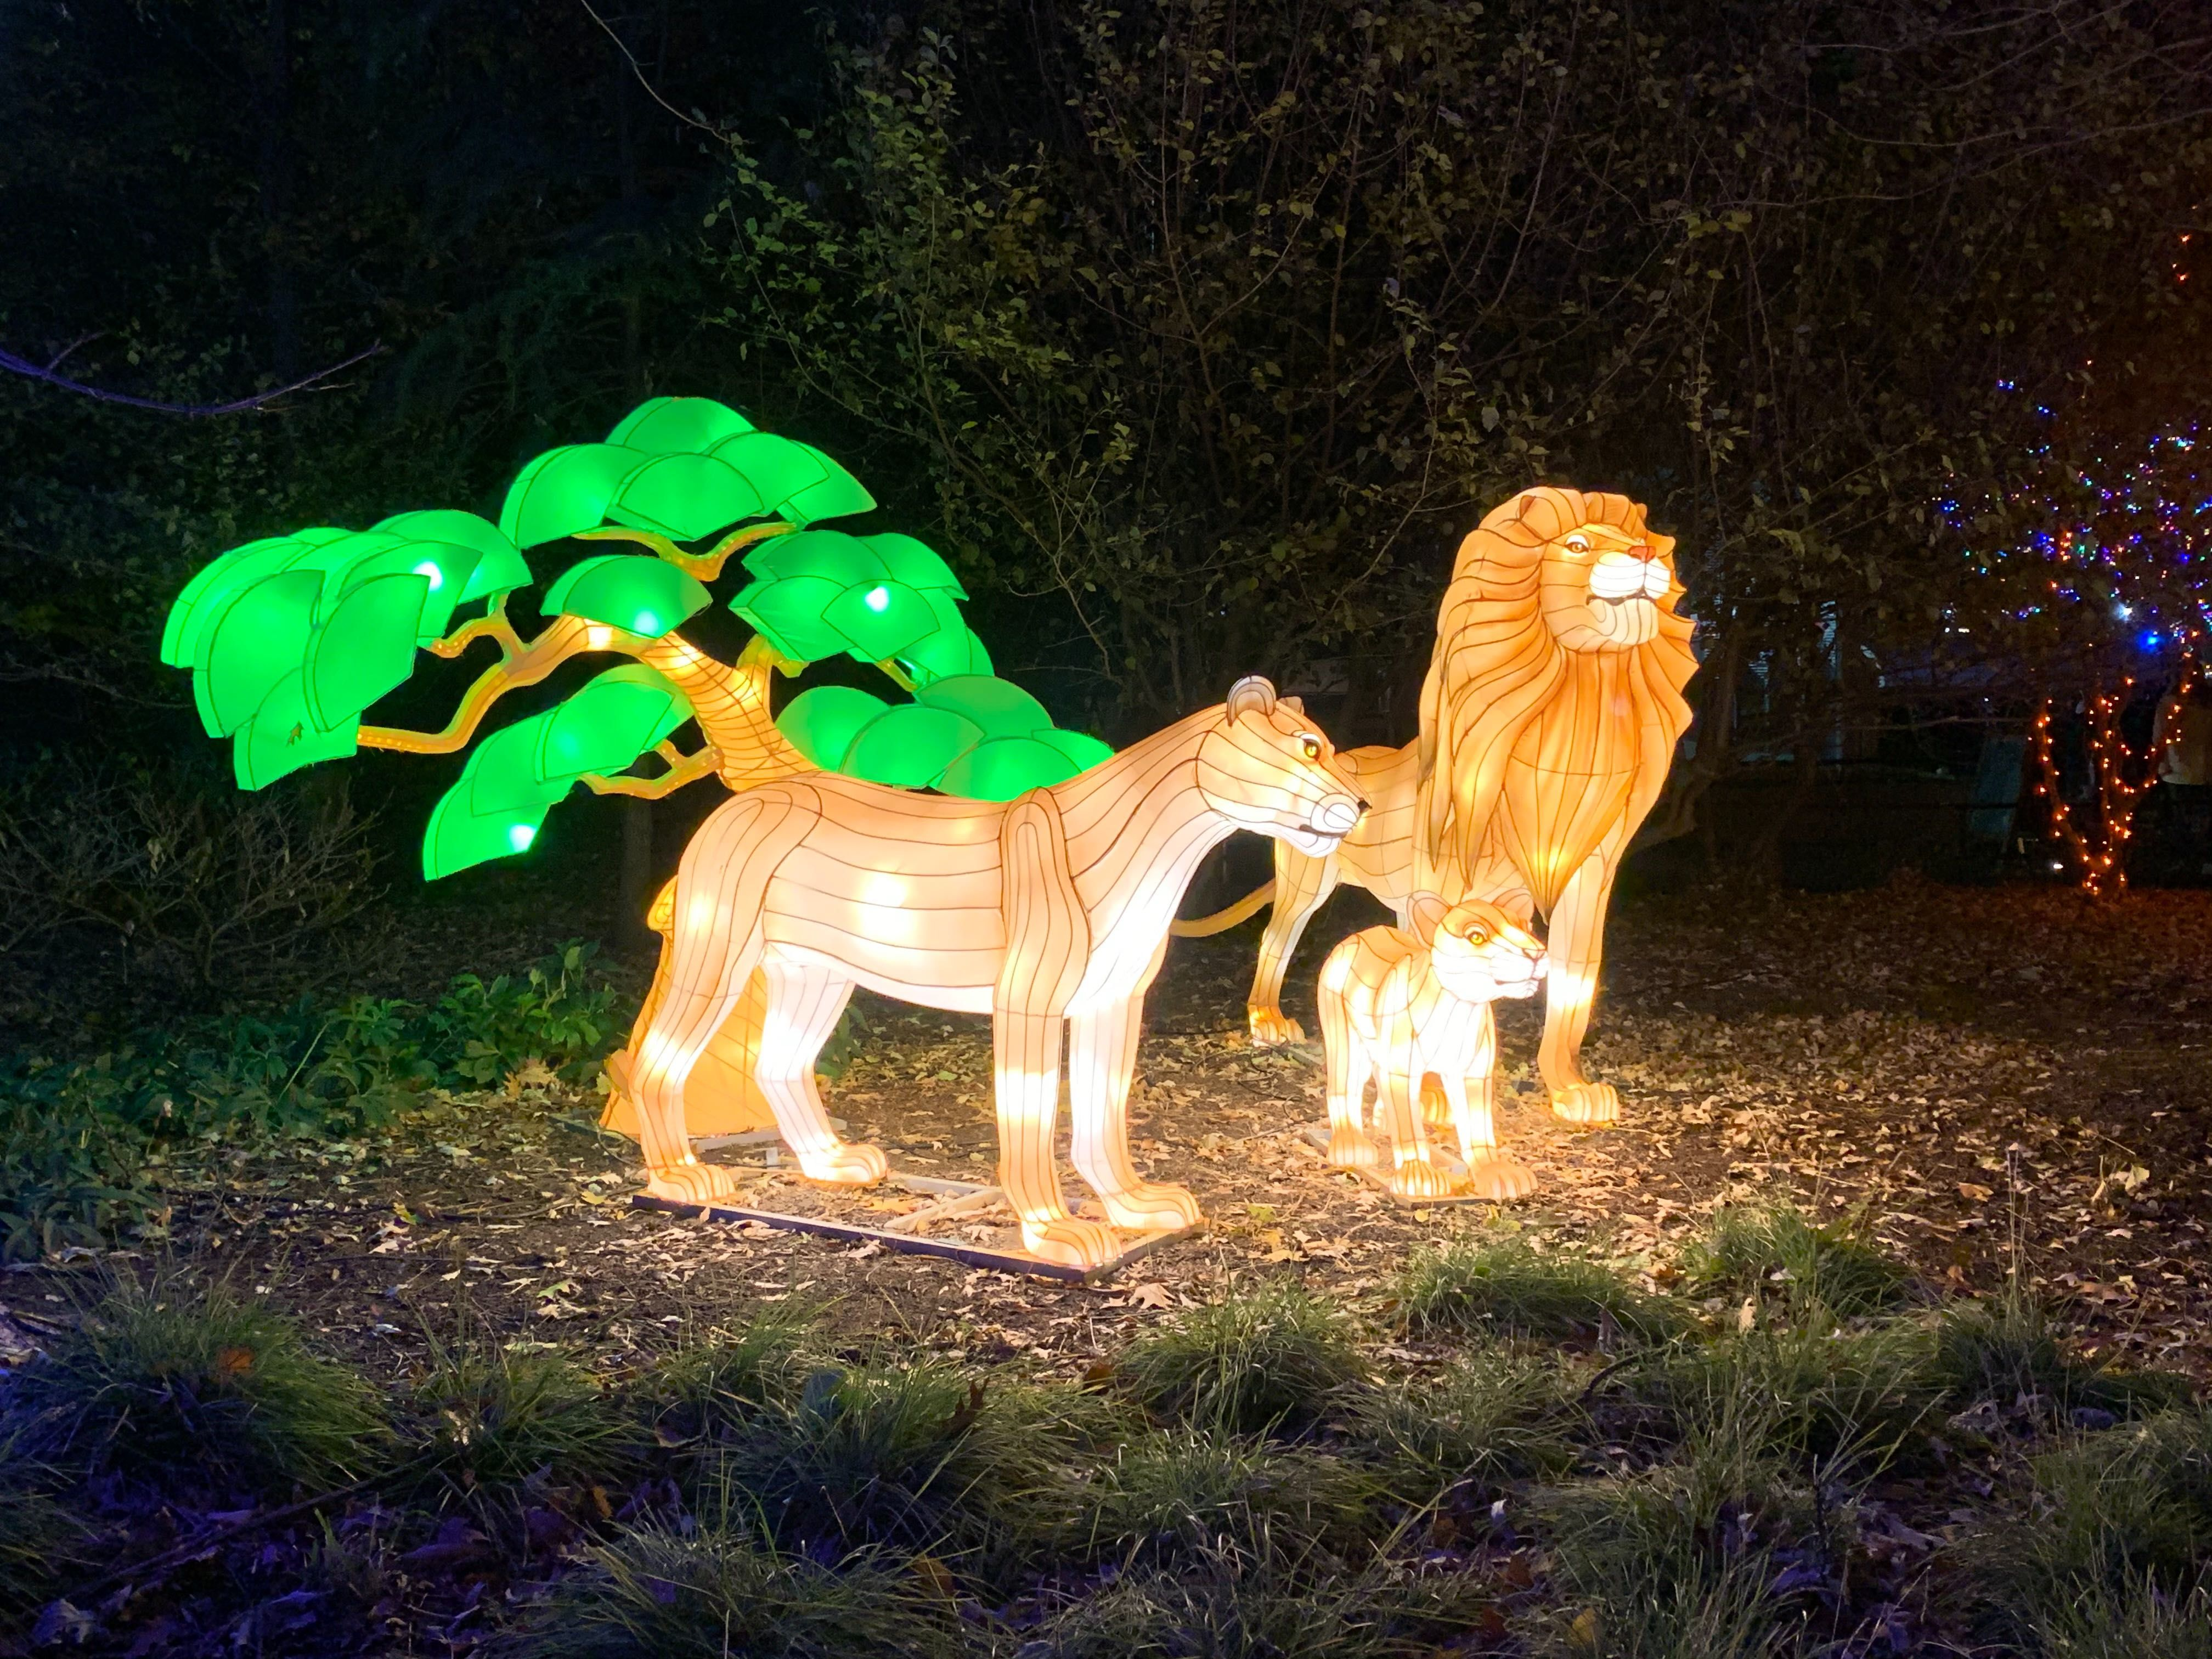 Dc Zoo Christmas Lights 2020 ZooLights brings glowing animal lanterns, virtual reality